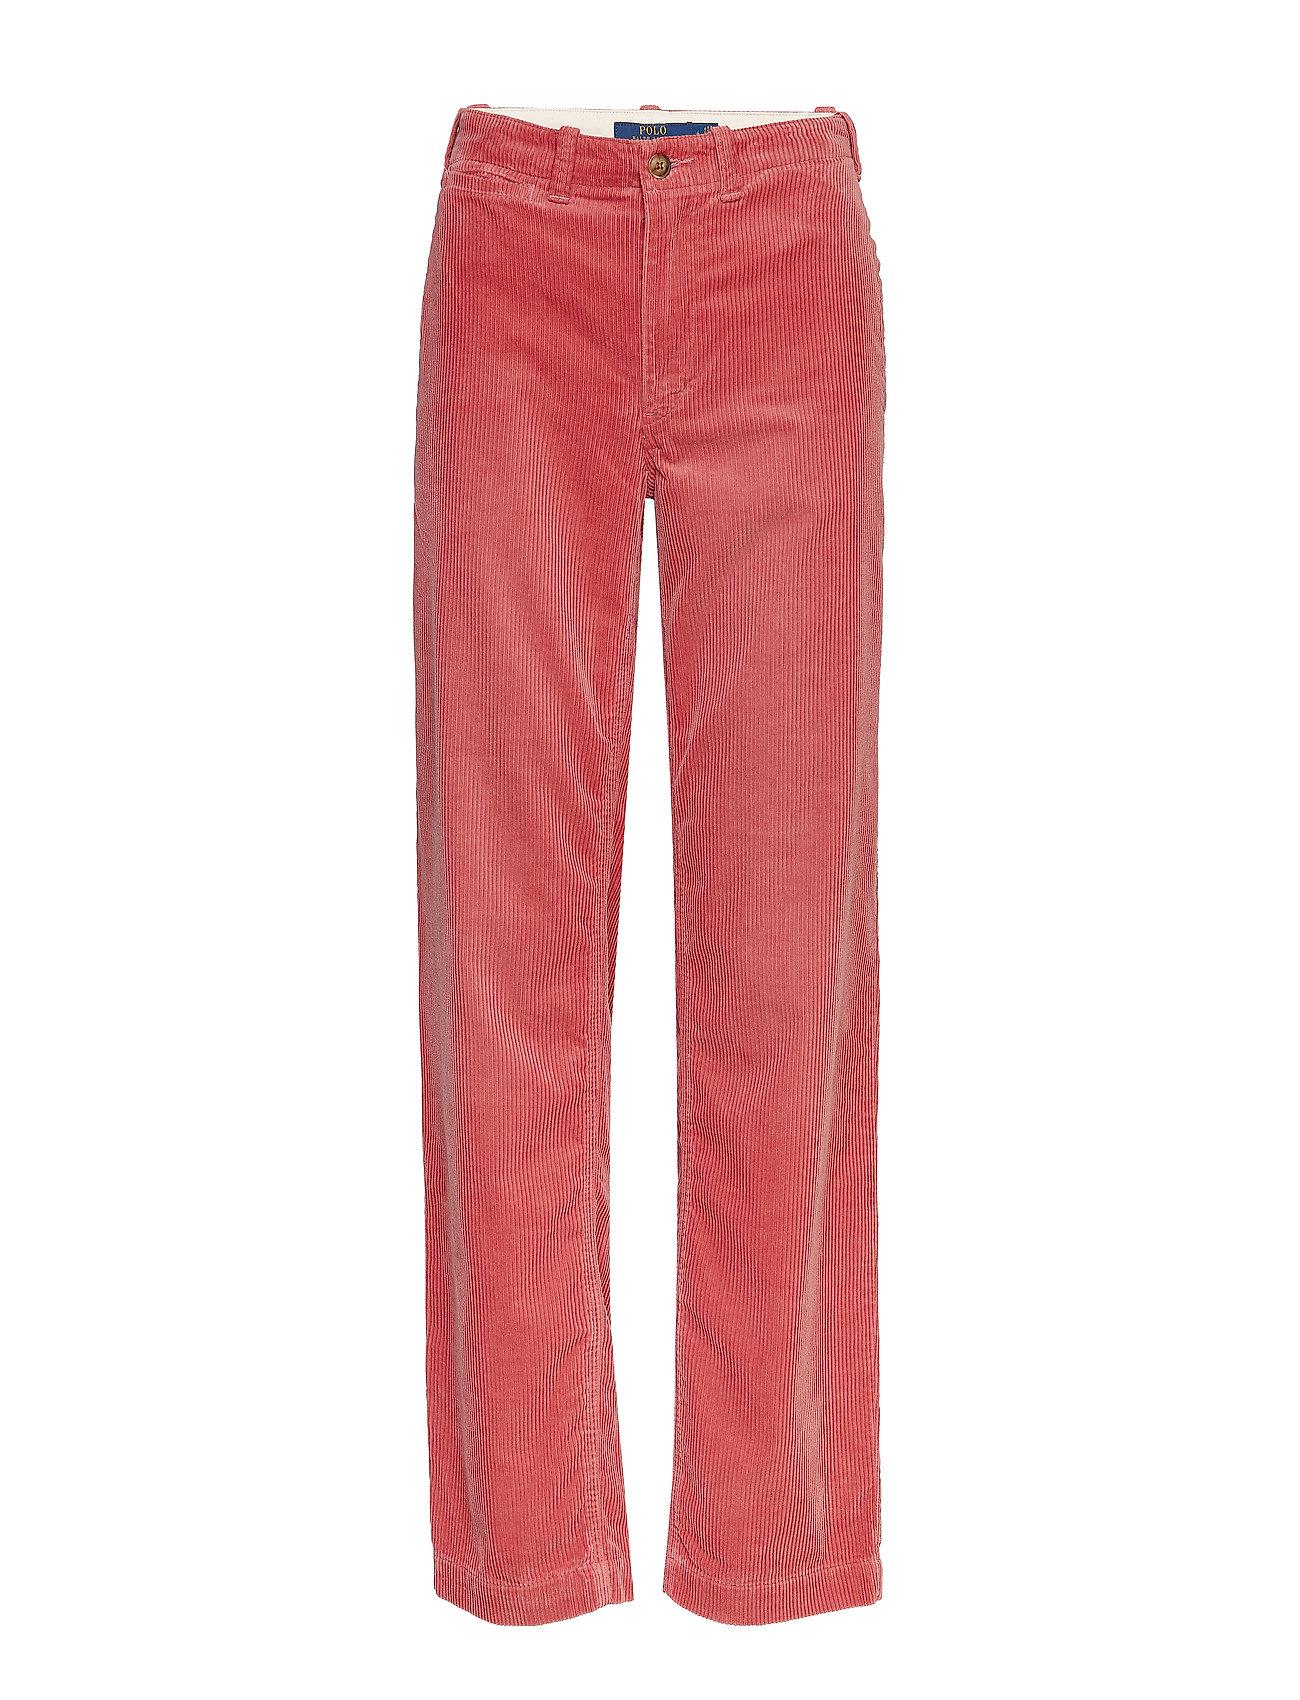 Polo Ralph Lauren Cotton Corduroy Straight Pant - DESERT ROSE